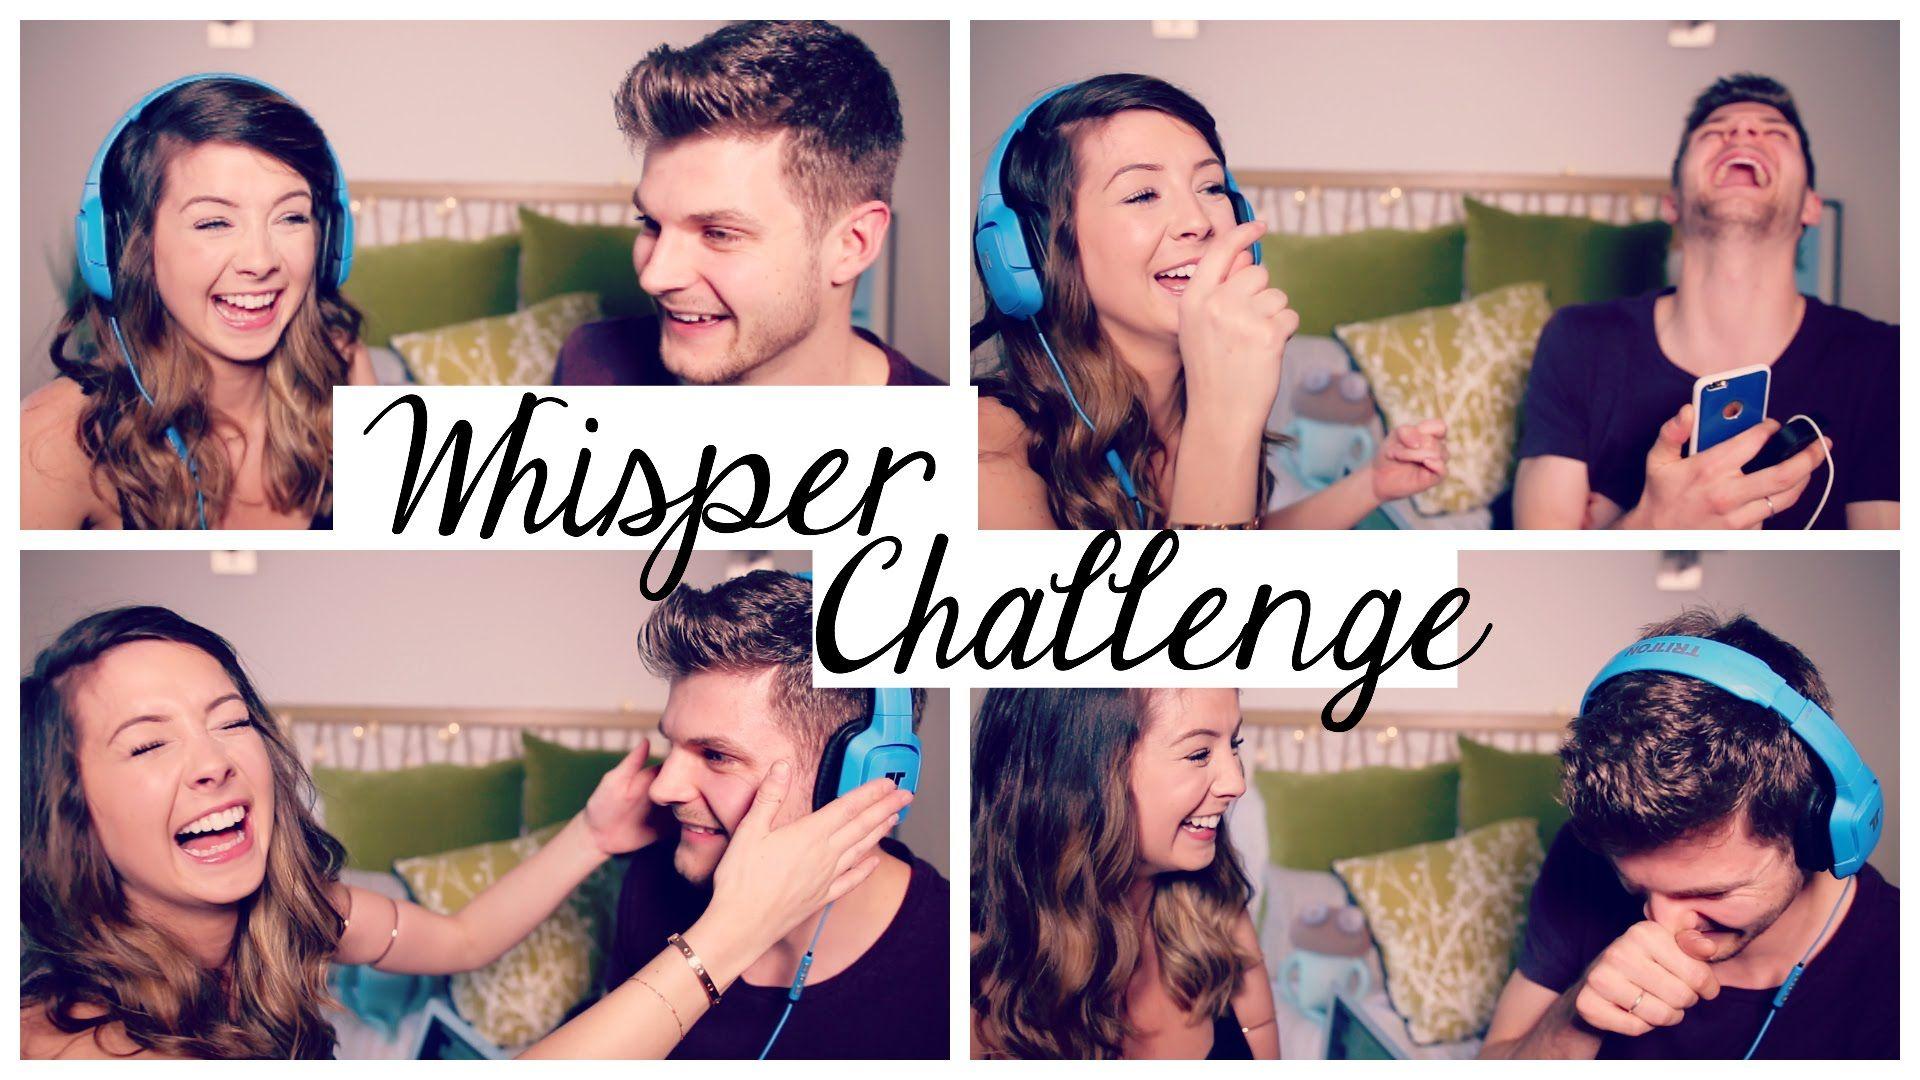 Download Whisper Challenge Google Play softwares ...   Whisper Challenge Ideas